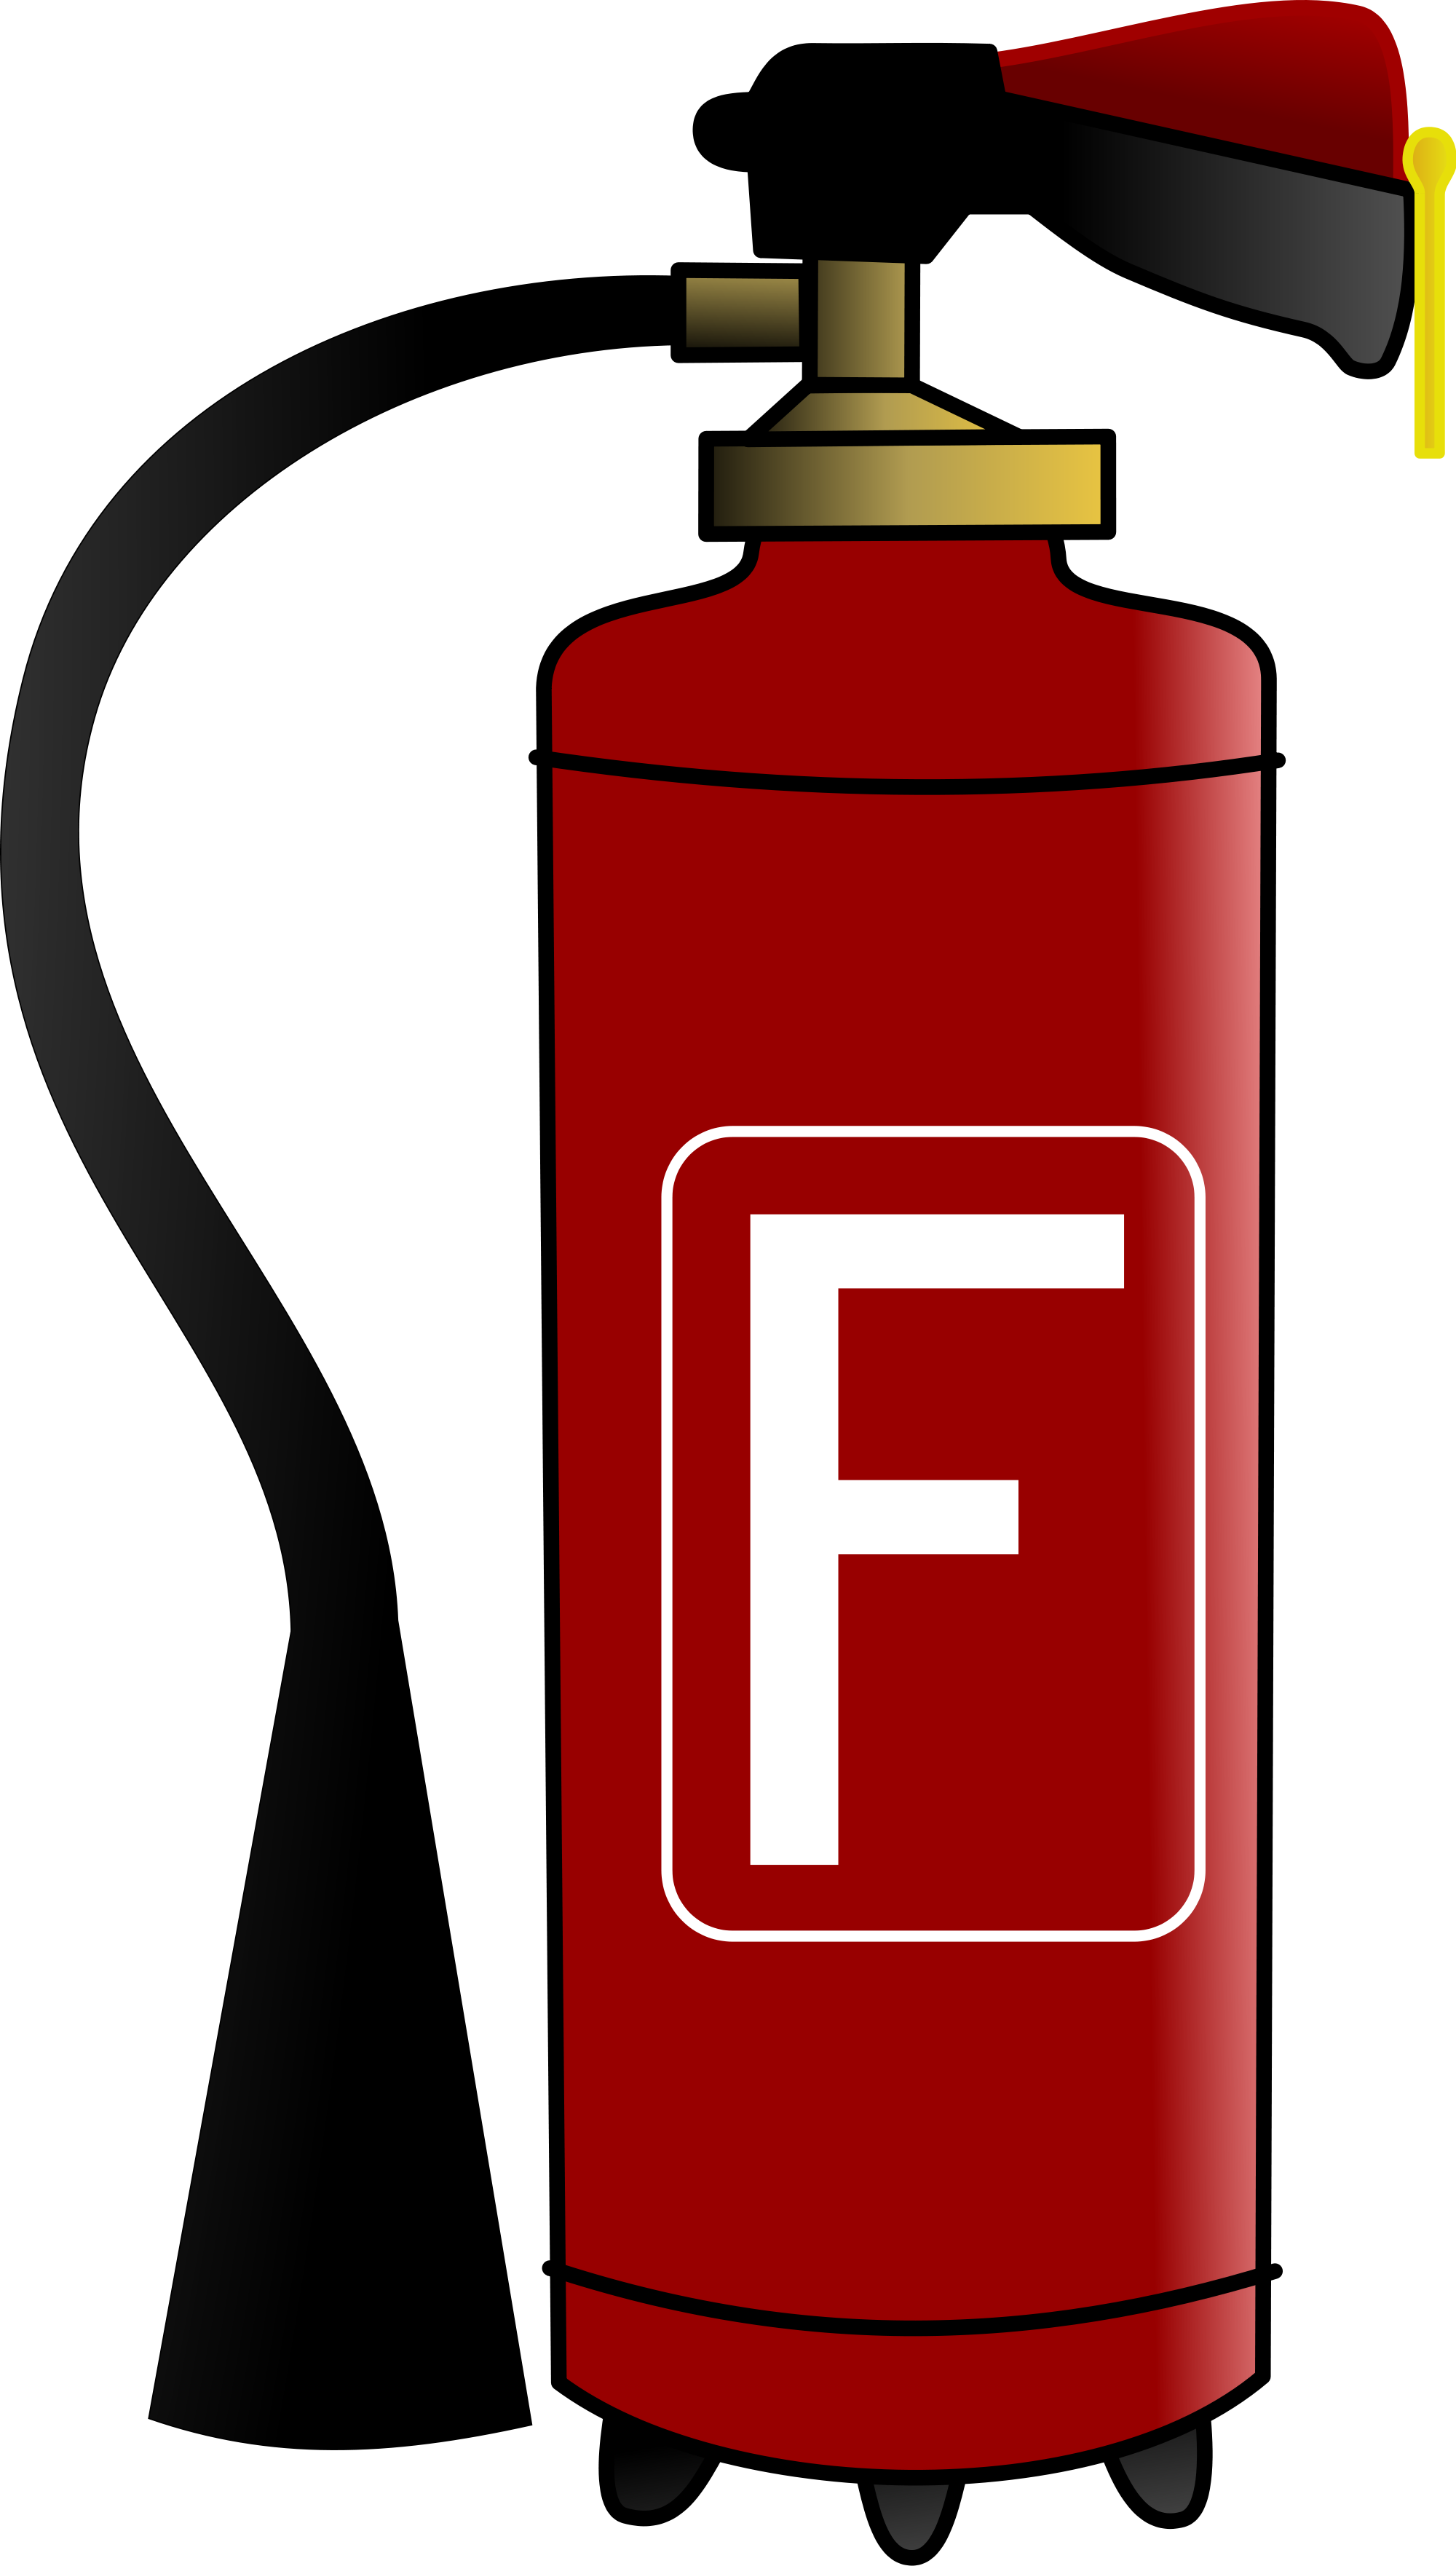 Thumb clipart fire. File extinguisher svg wikimedia